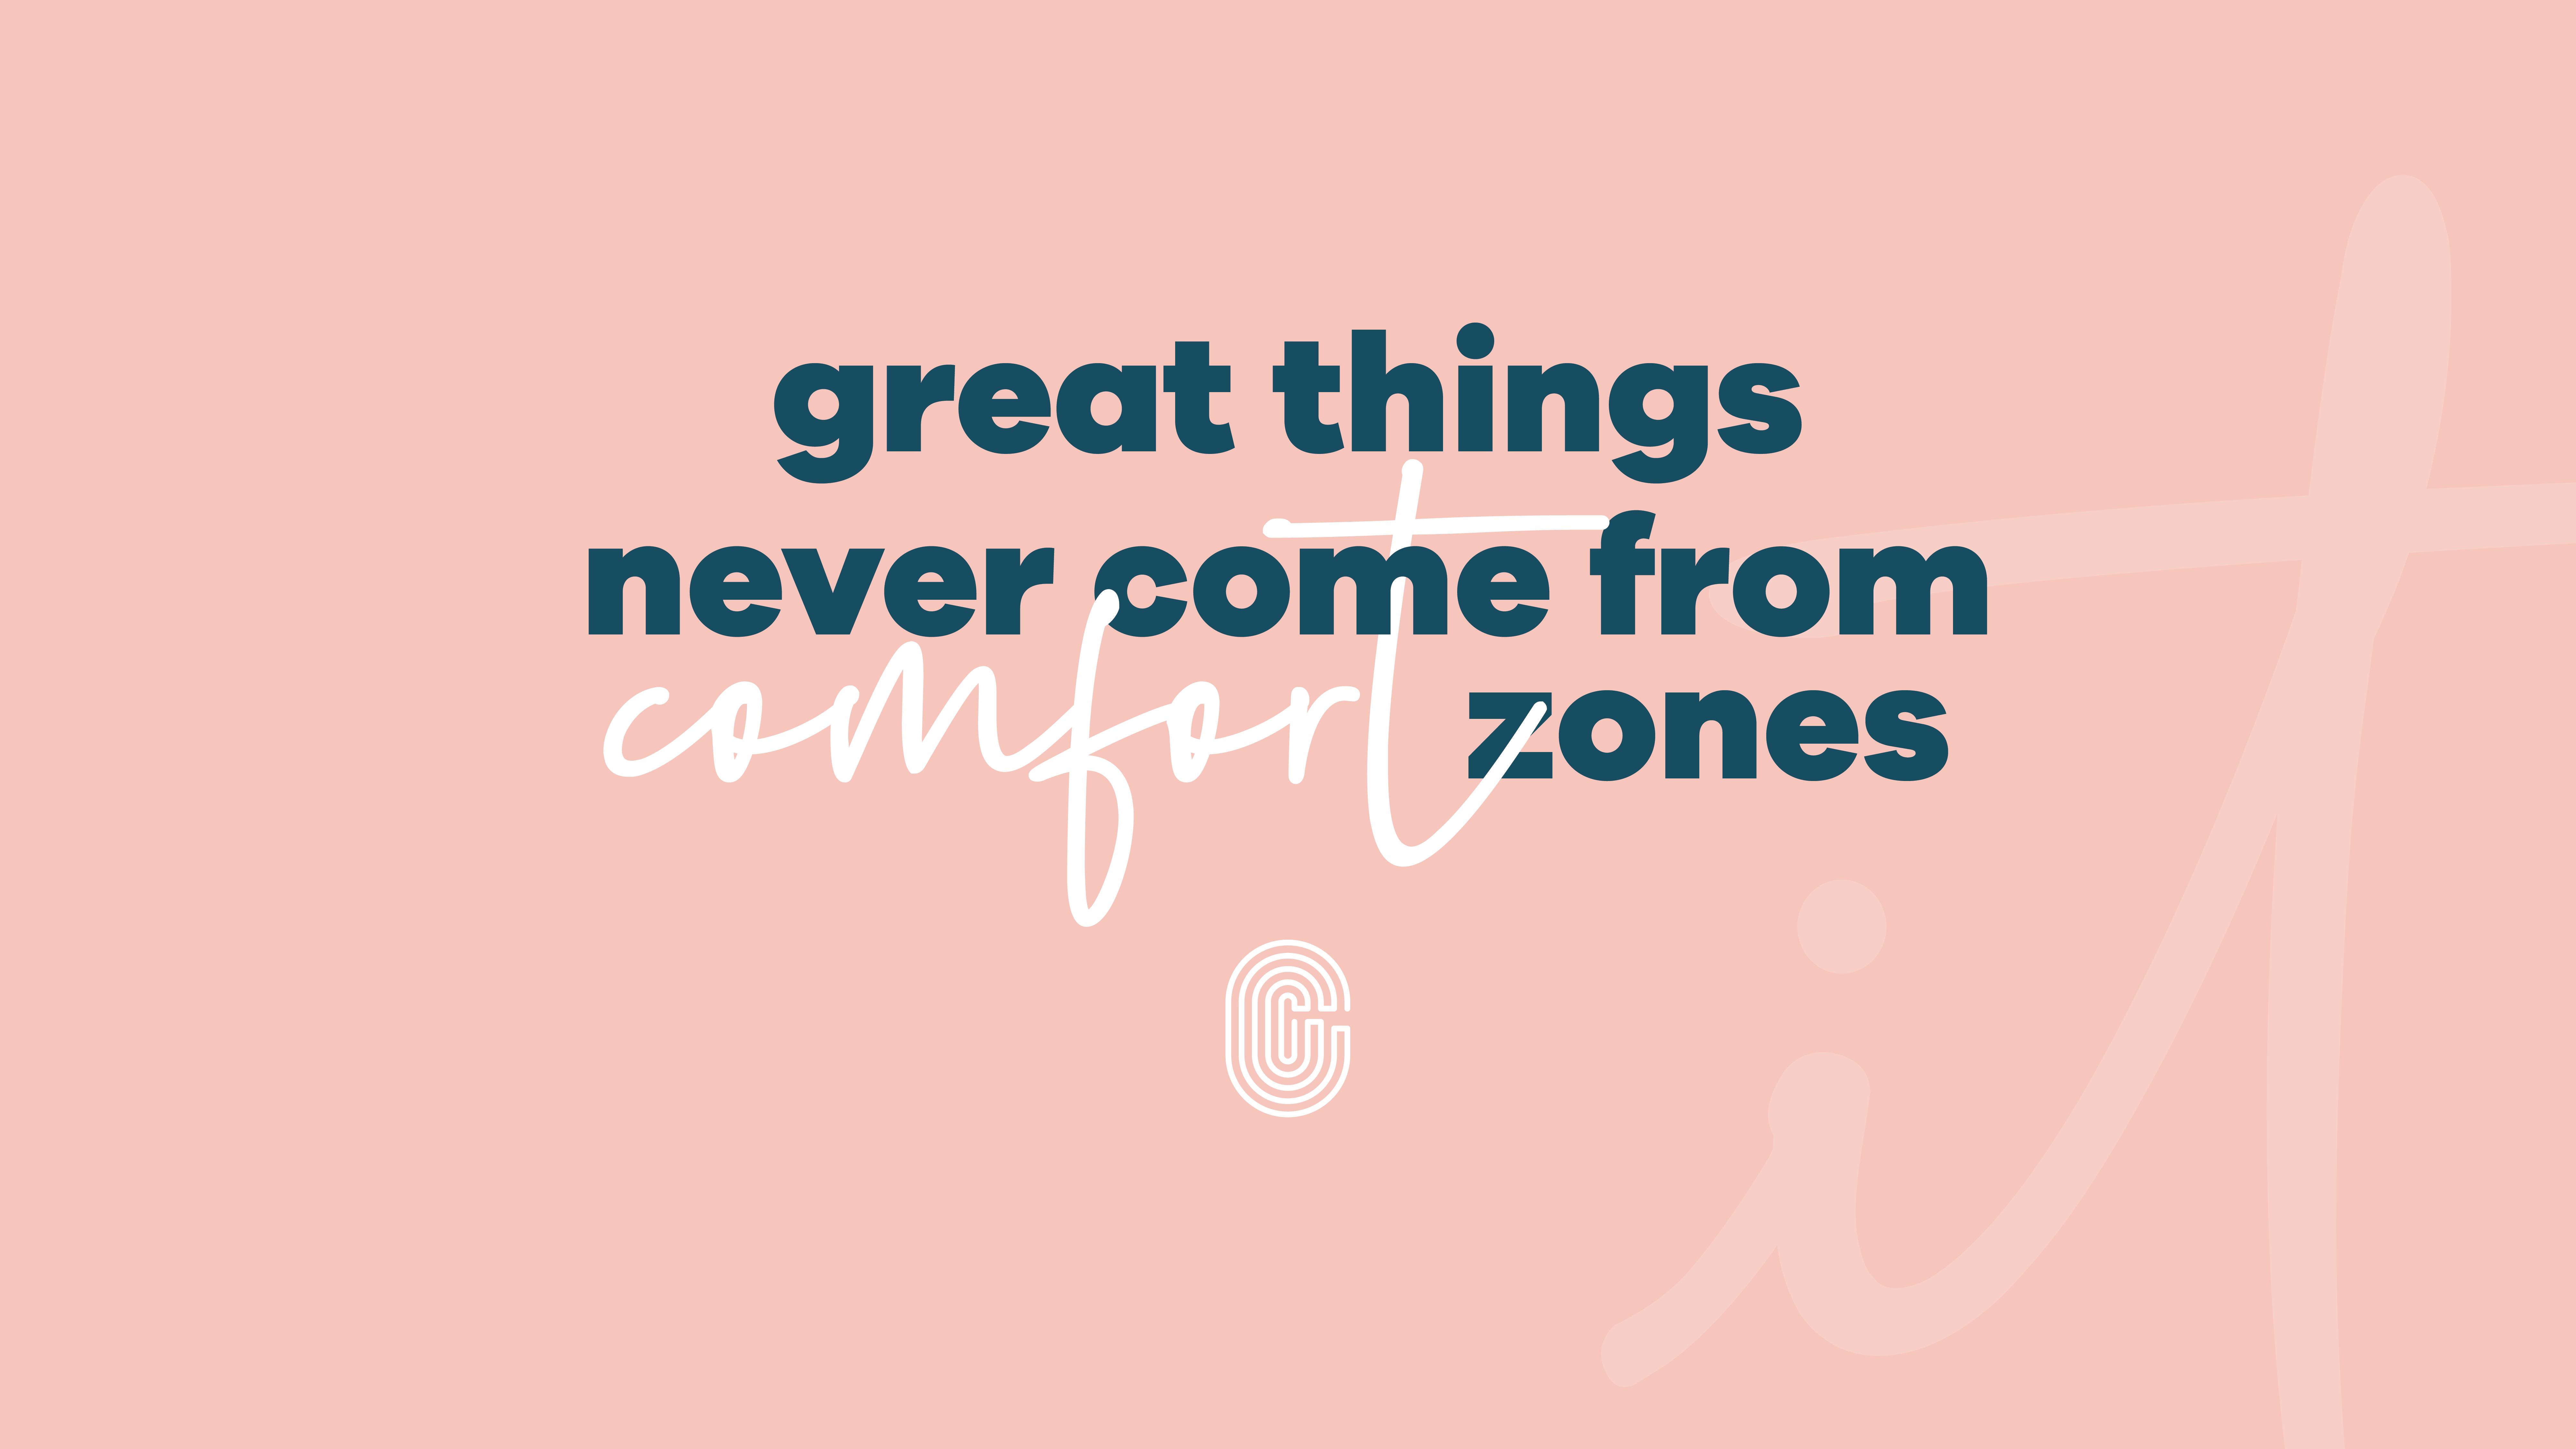 great things come from comfort zones branded desktop wallpaper